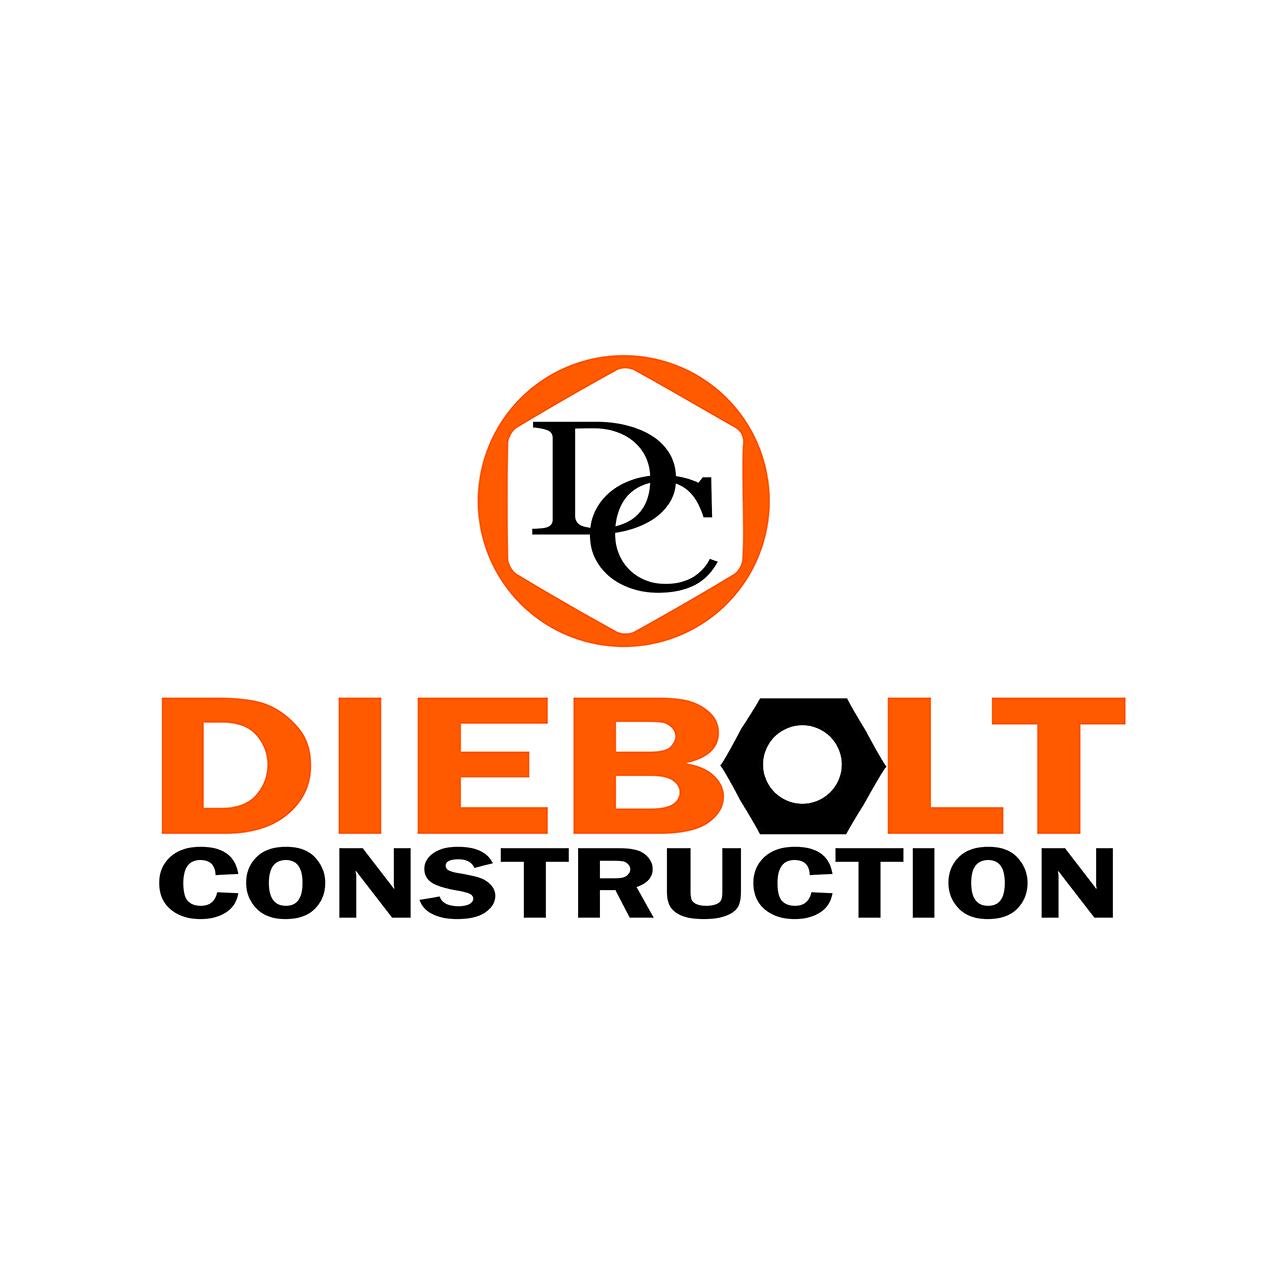 Diebolt Construction